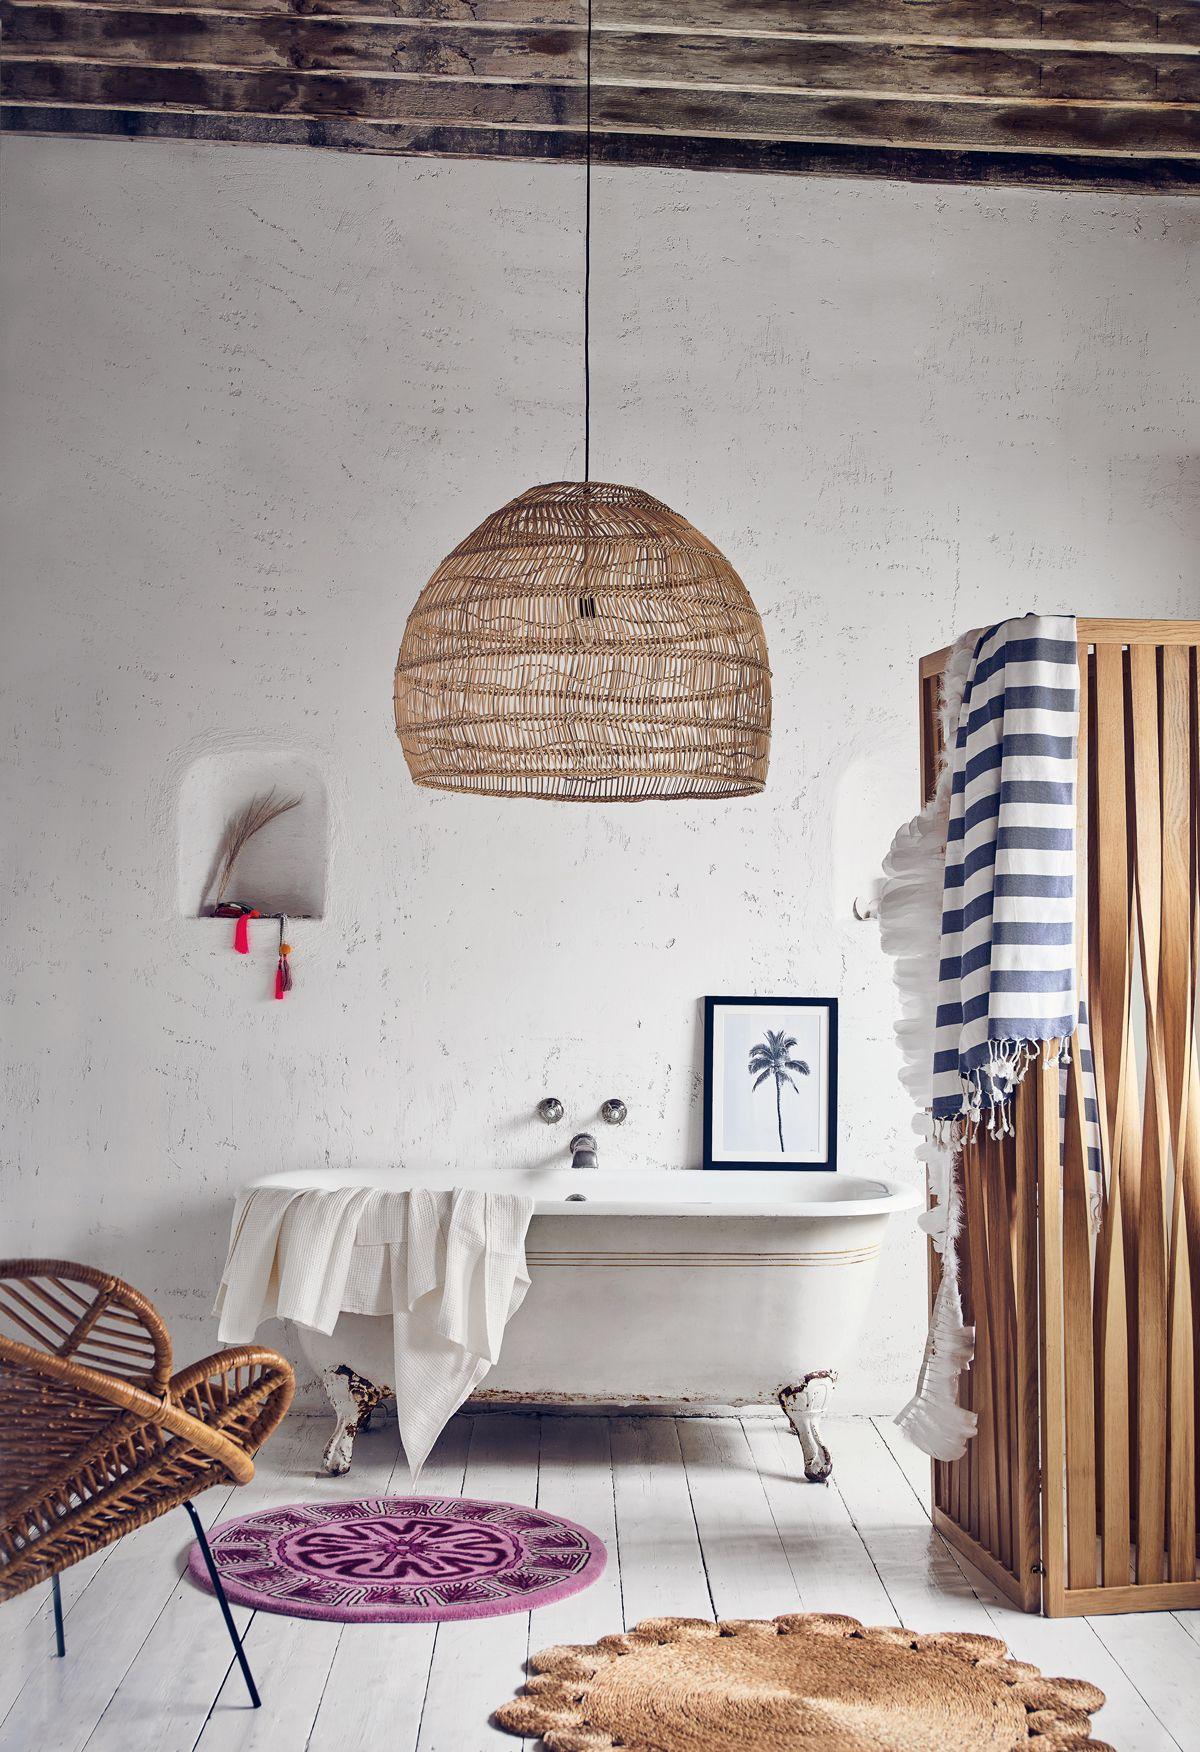 Interior Design Trend 2018 Modern Ibiza Coachella Festival Boho Vibes